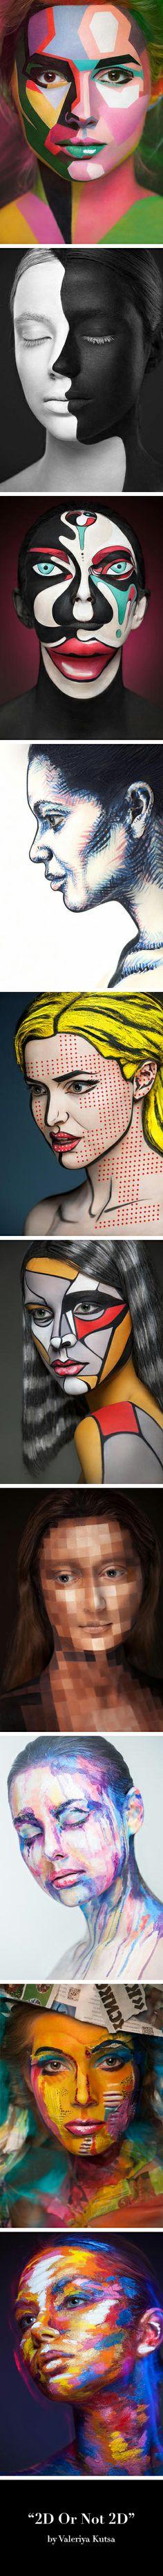 """2D Or Not 2D"" by Russian make-up artist Valeriya Kutsan. Photography by Alexander Khoklov and post-processing expert Veronica Ershova."